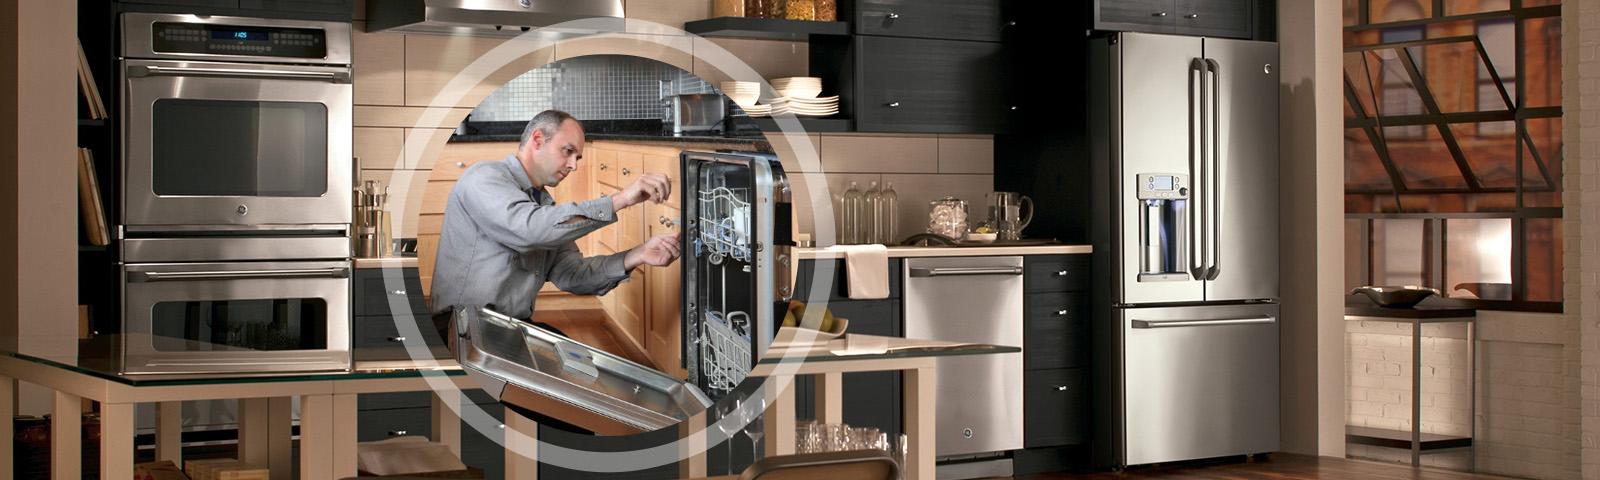 appliance repairs